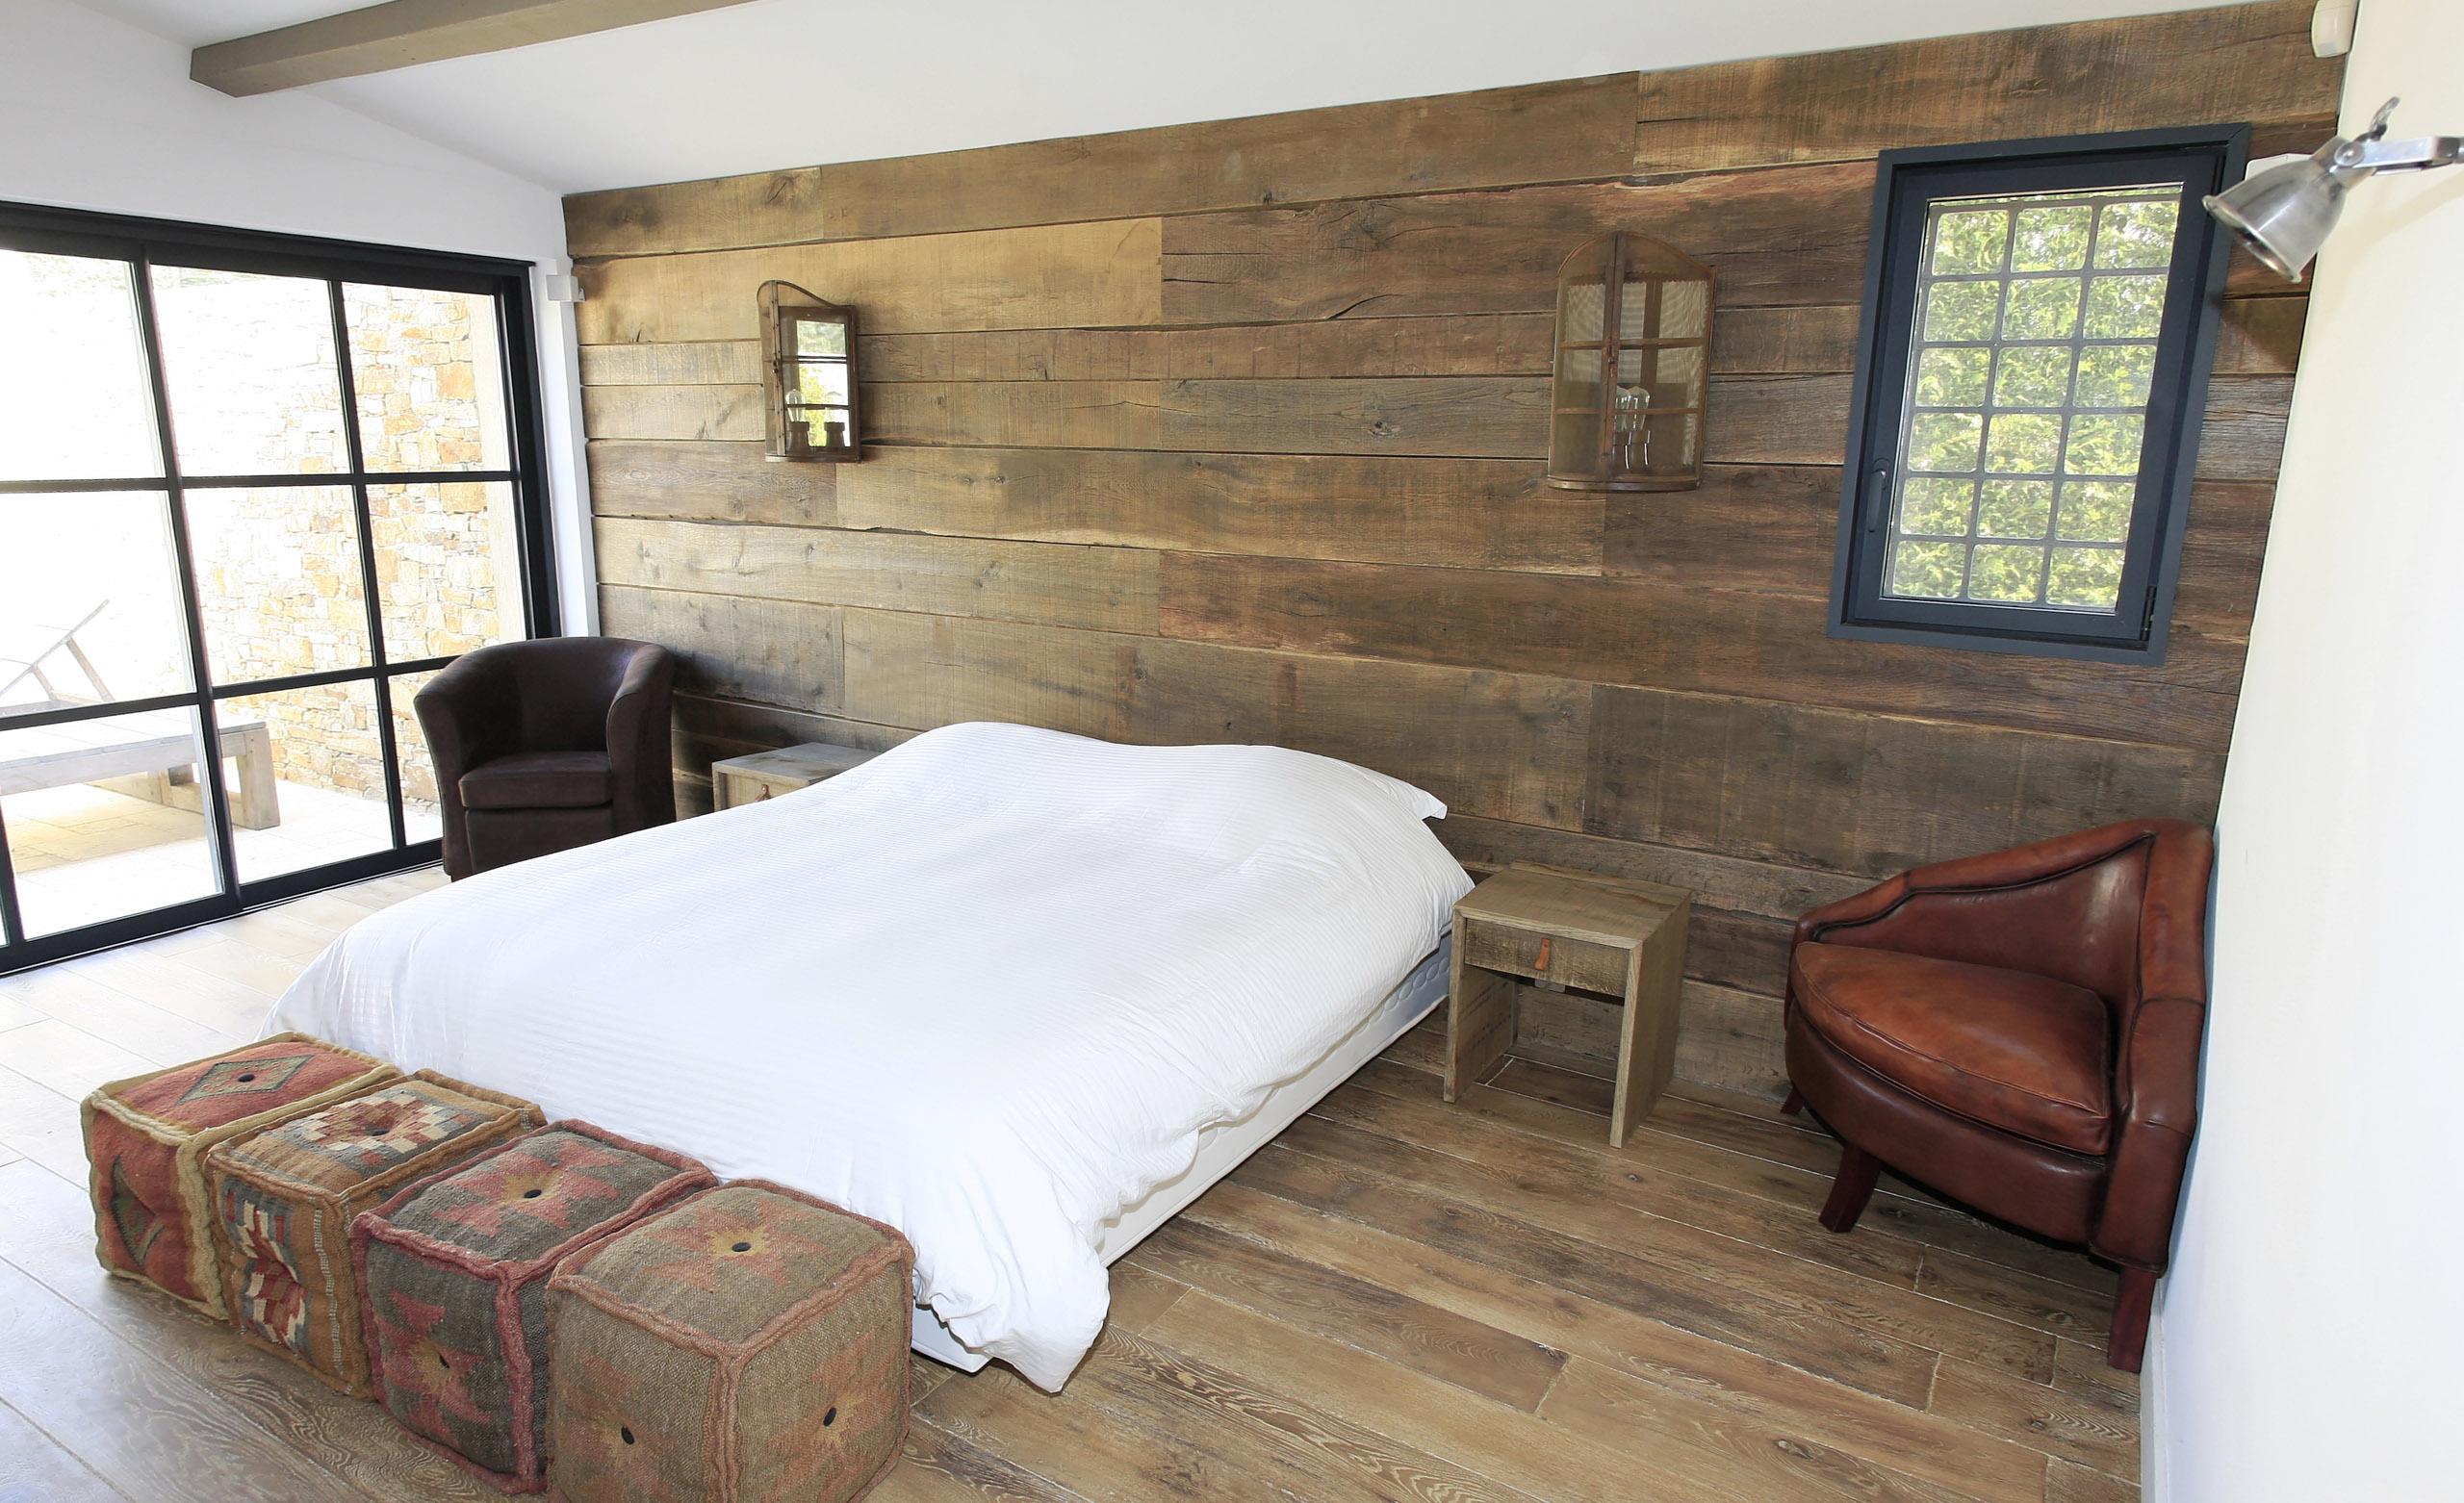 Chambre de villa grimaud bv menuiserie rafflin for Habillage mural en bois